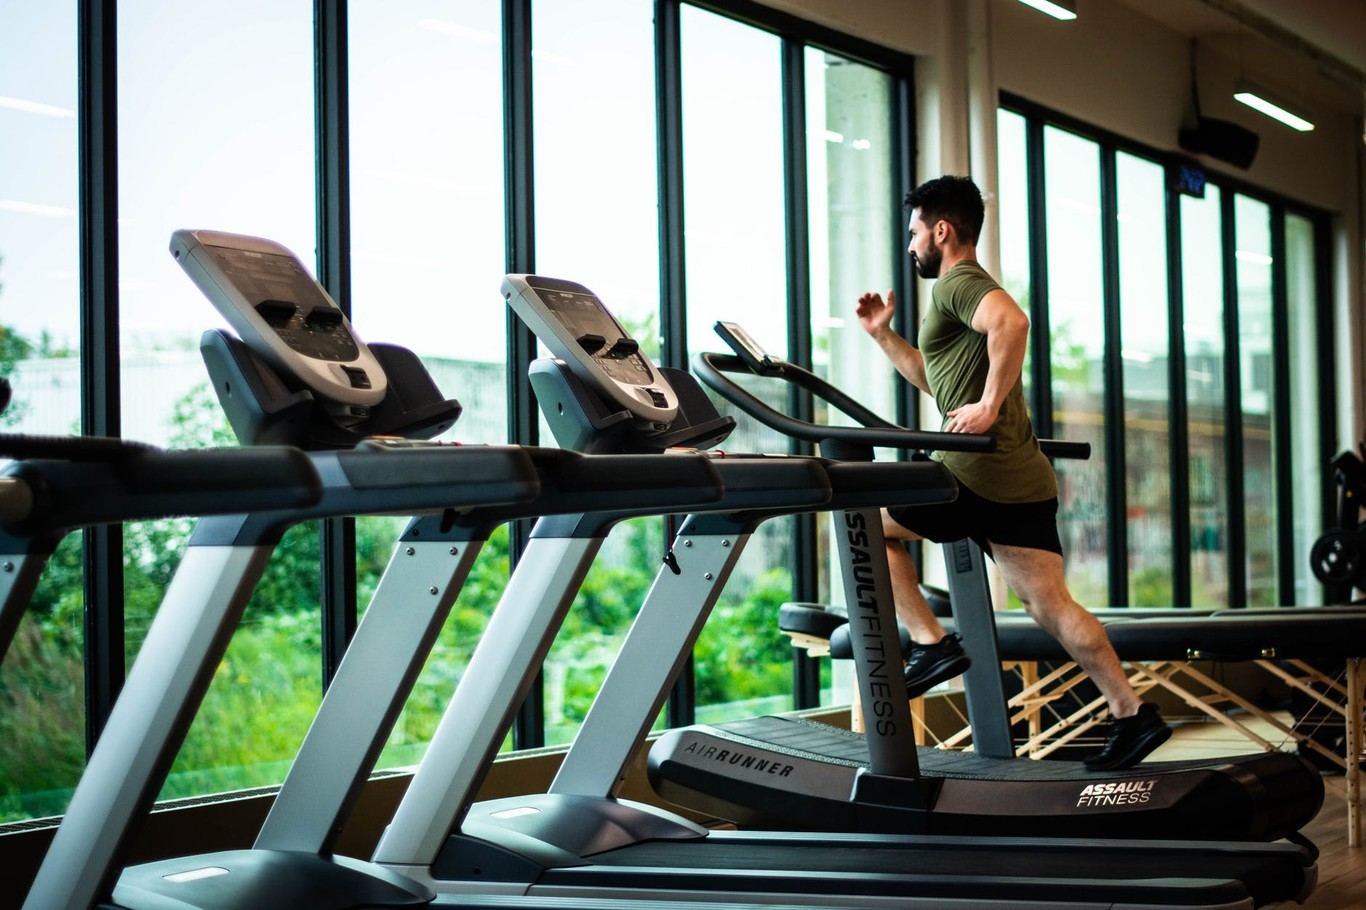 para adelgazar es mejor cardio o pesas